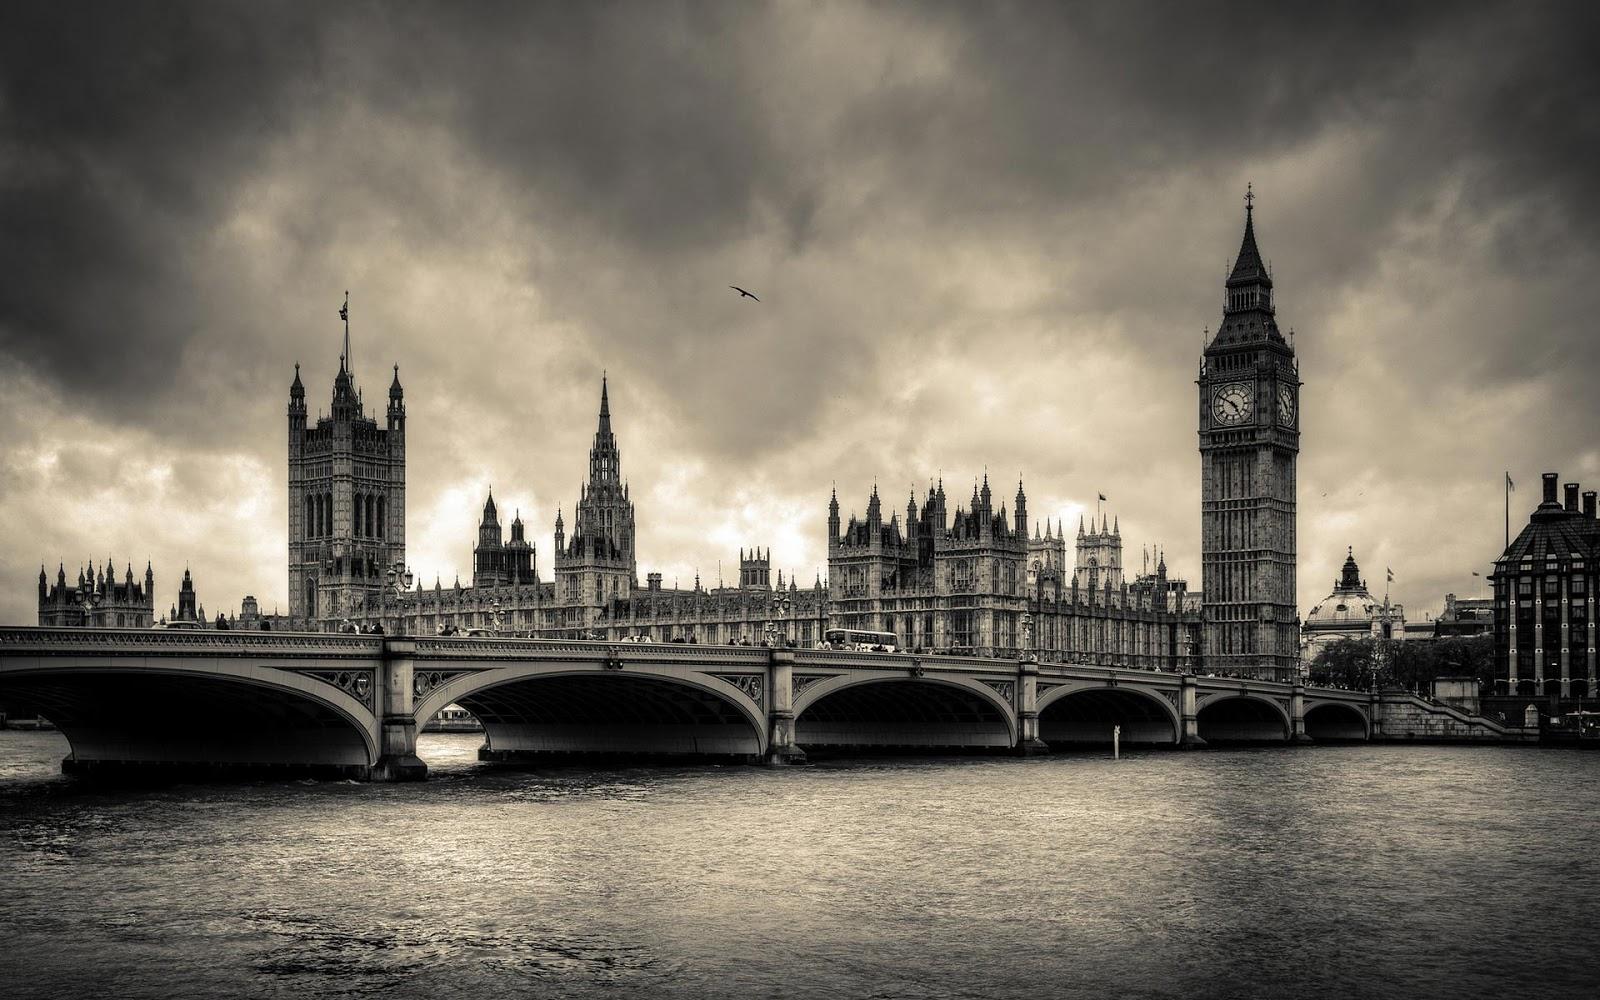 london wallpaper wallpaperwallpapersfree - photo #11